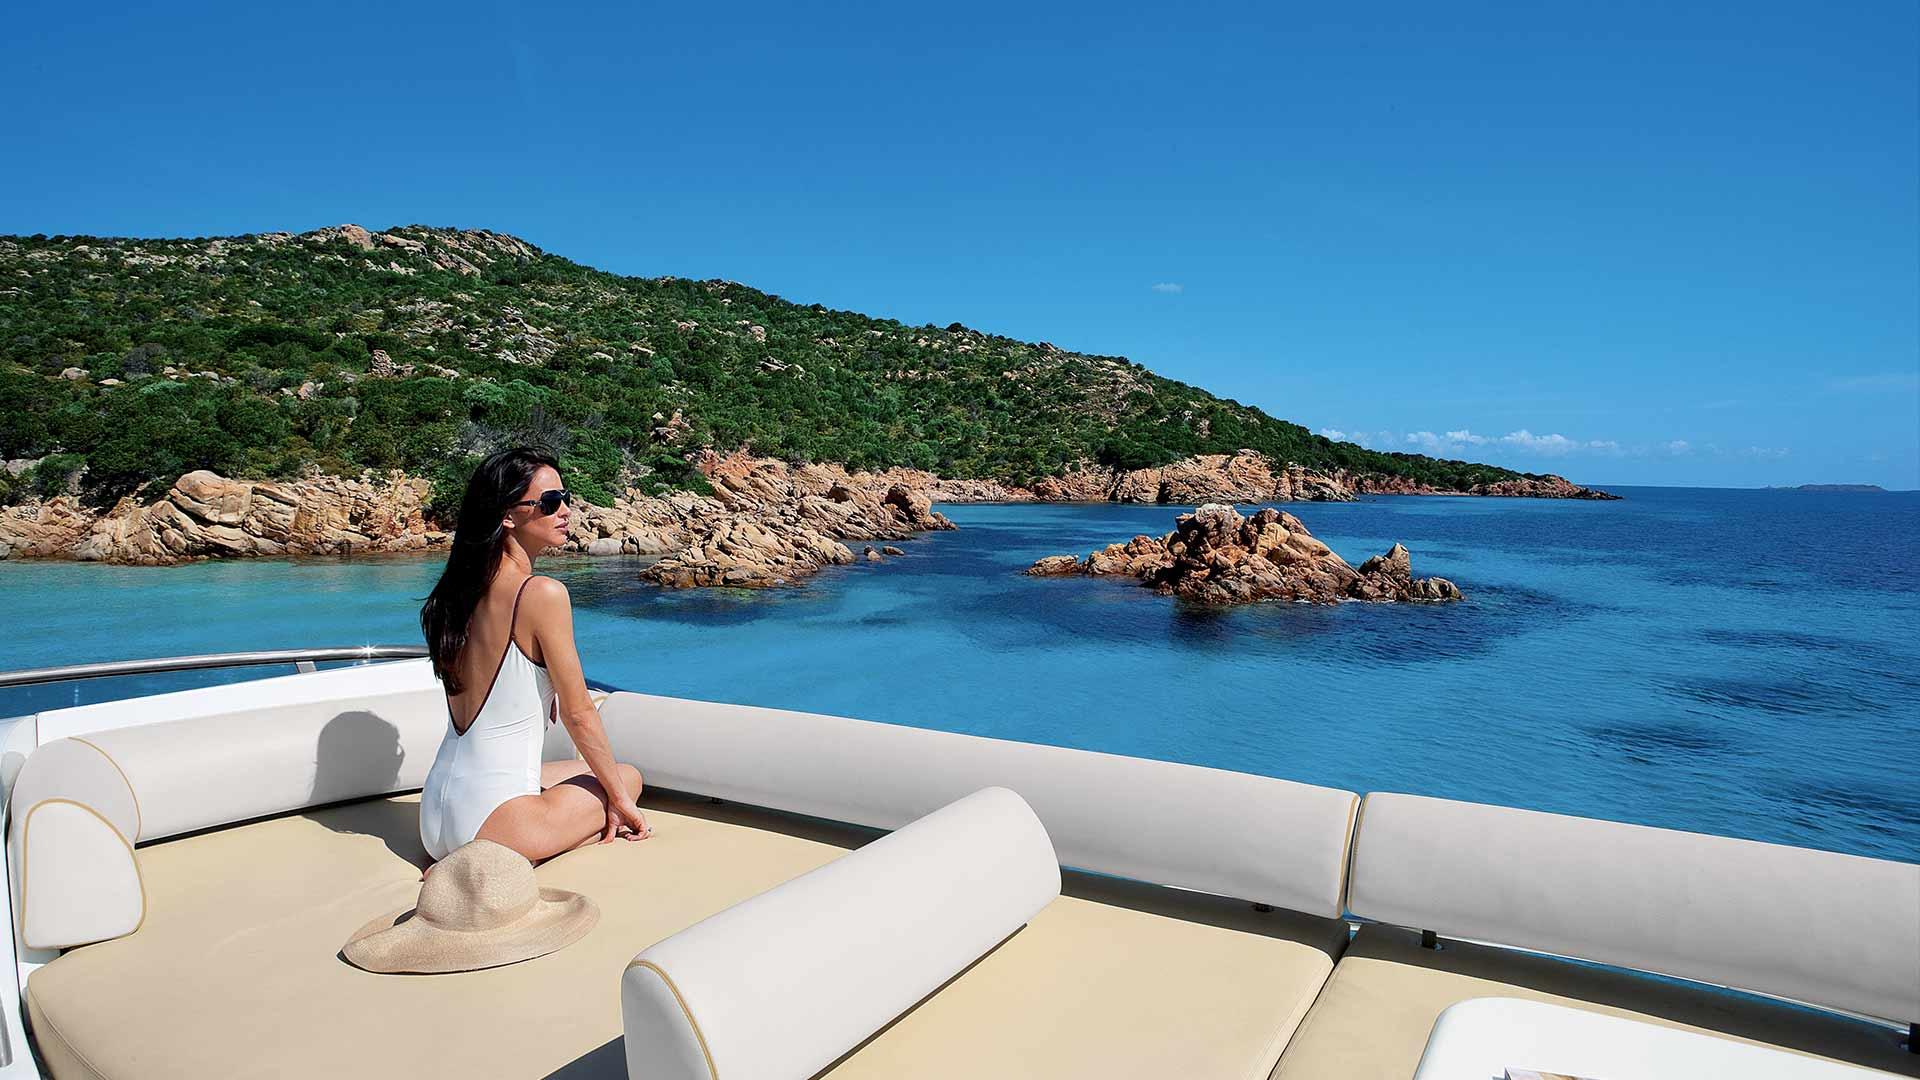 Azimut Yacht Wife on yachts